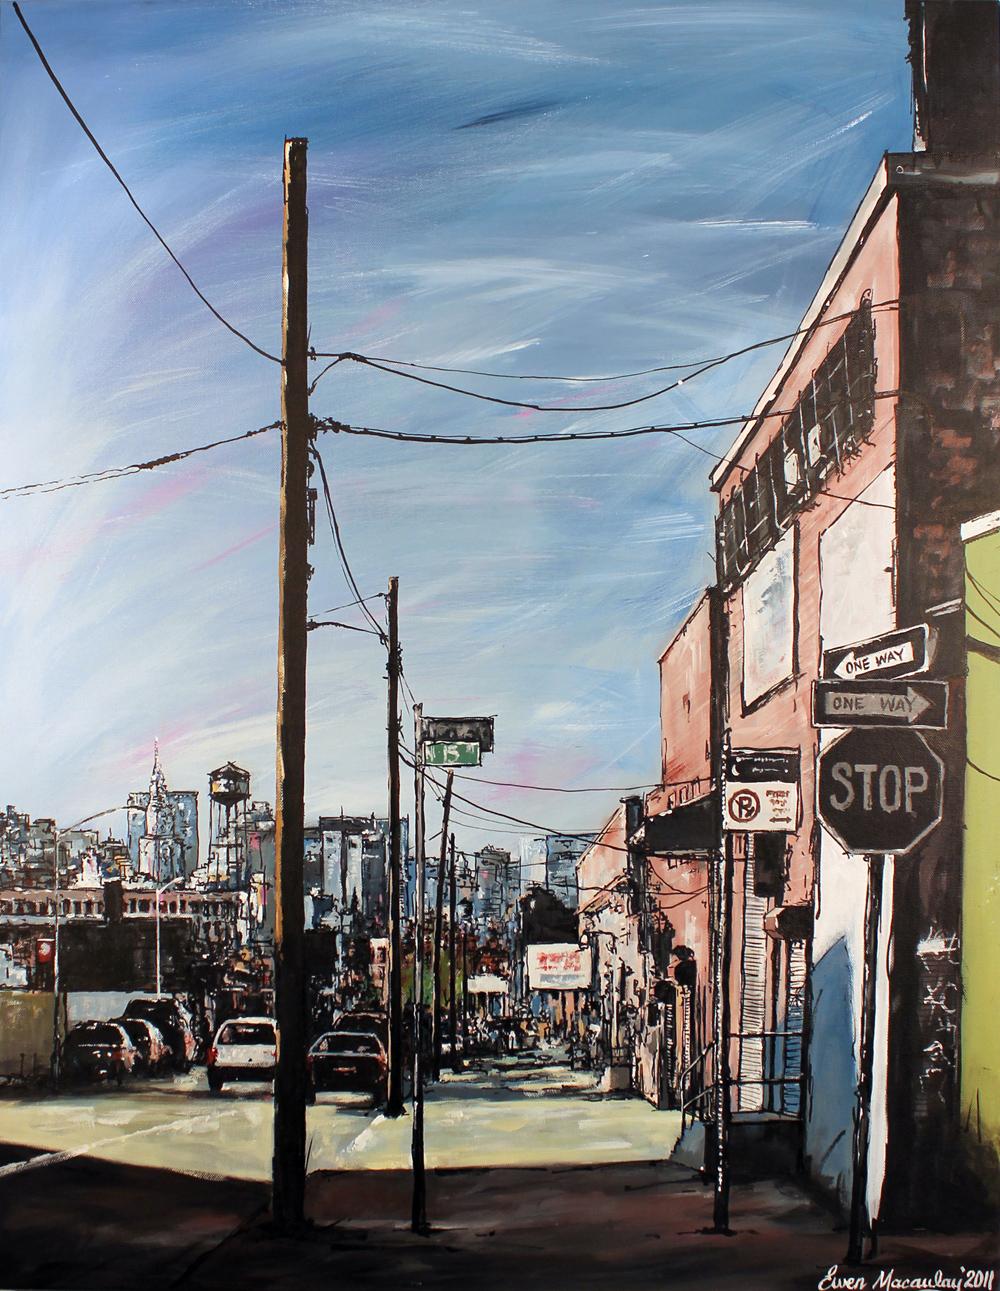 Ewen Macaulay, Original acrylic painting on canvas, New York. Click to enlarge